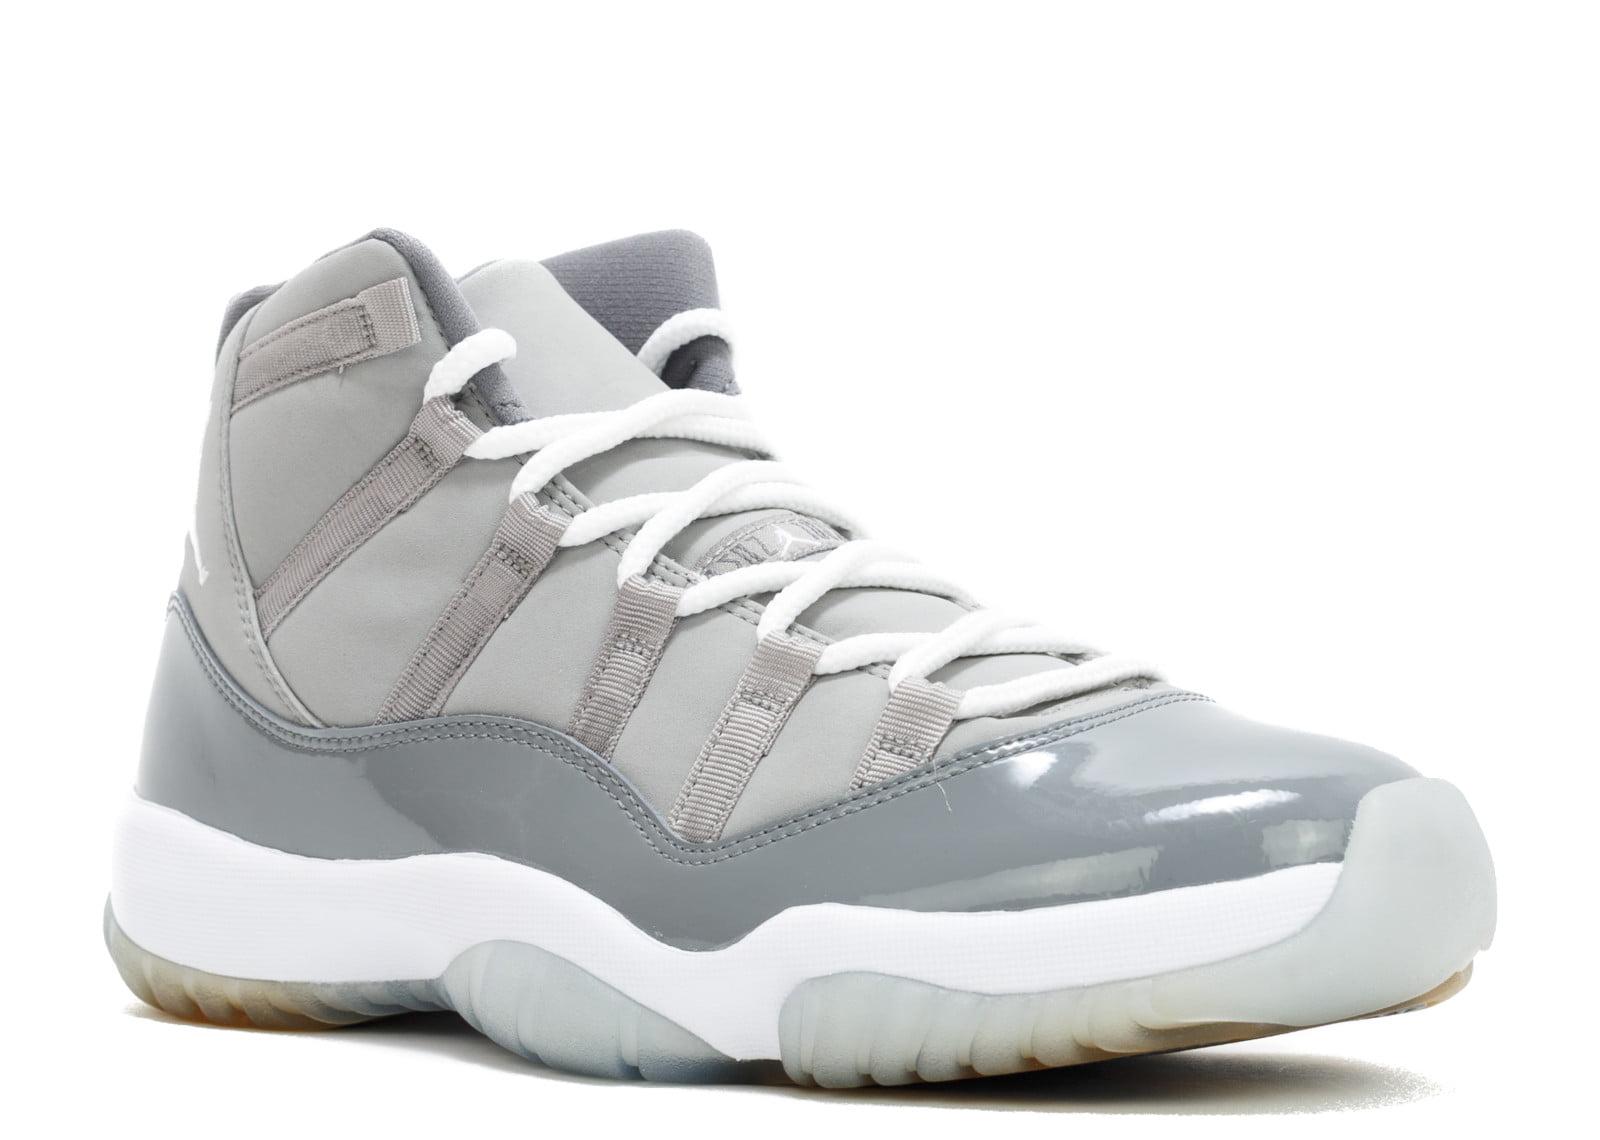 jordan 11 cool grey size 7